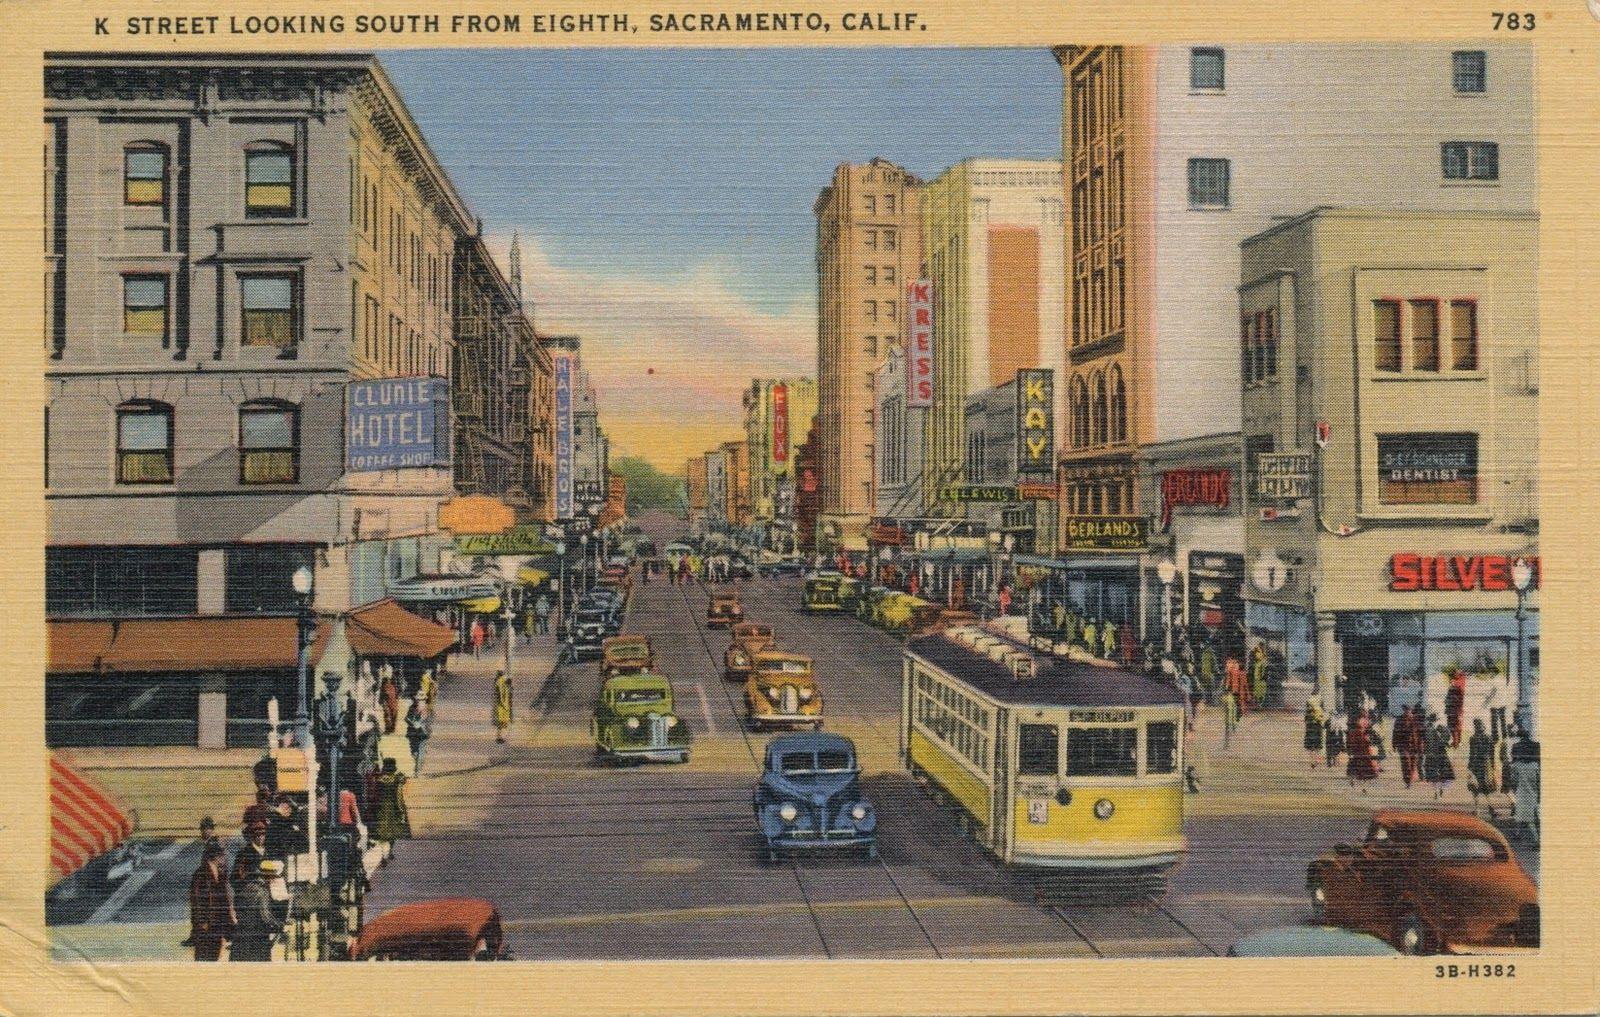 The Daily Postcard: Streetcar Sunday - Sacramento,